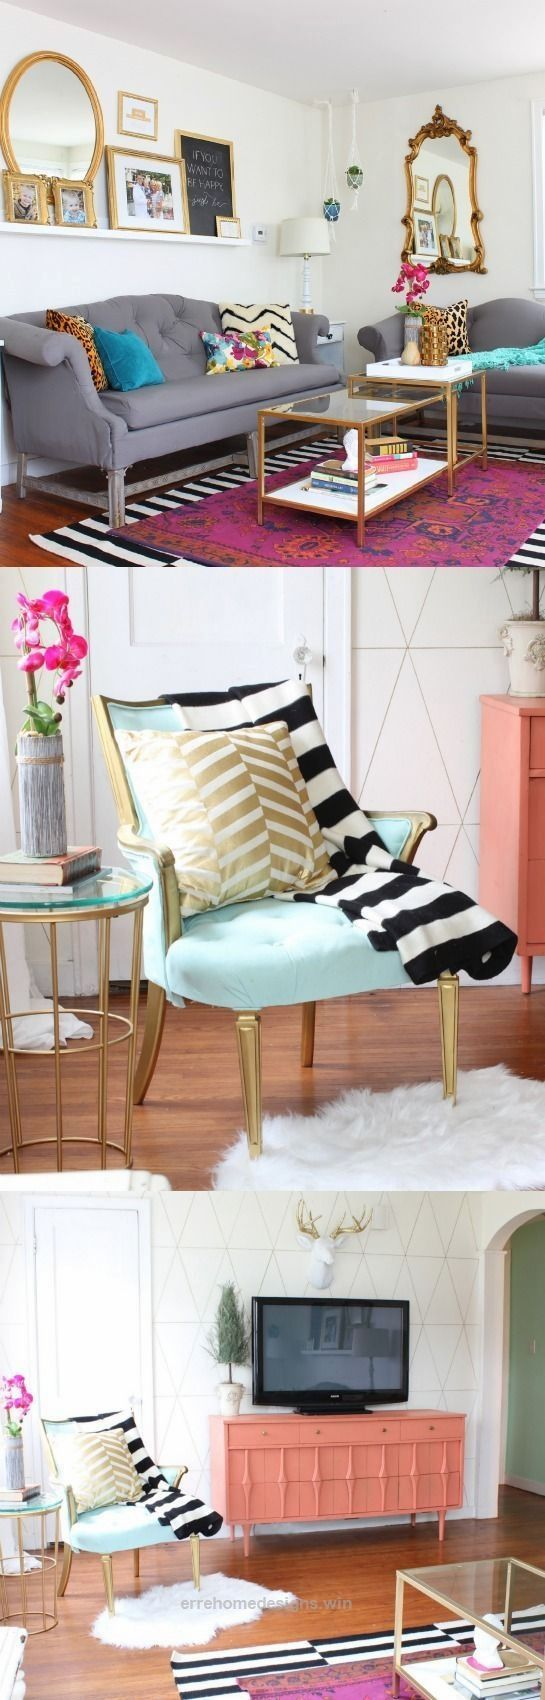 Home front bekommen design  best decor images on pinterest  home ideas homemade home decor